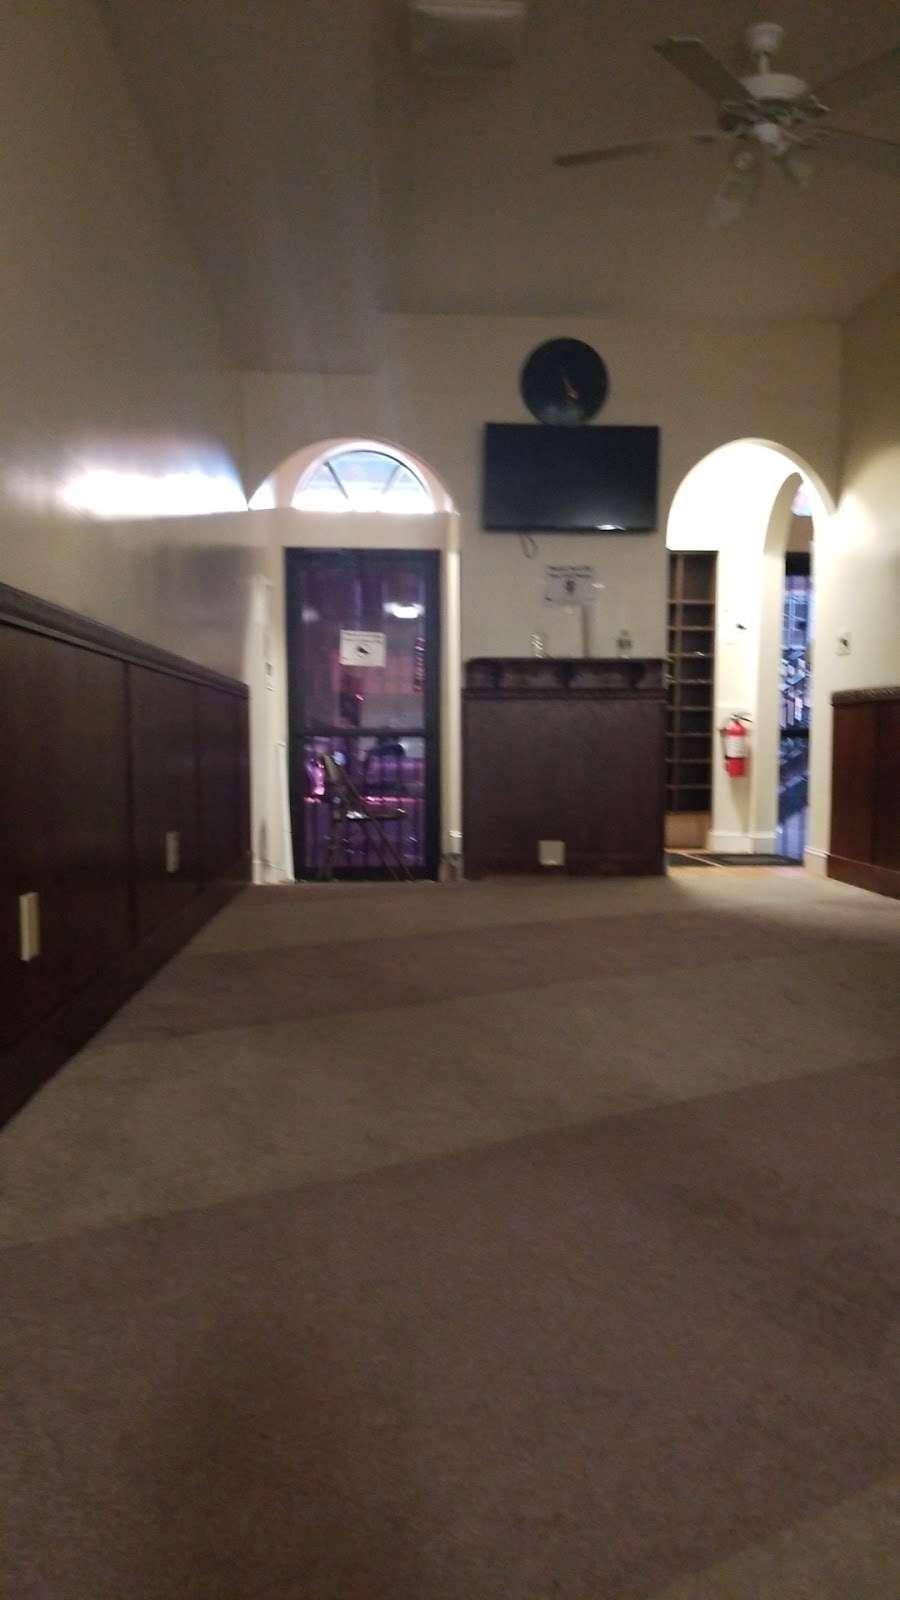 Masjid Al-Huda - mosque  | Photo 4 of 5 | Address: 3979 White Plains Rd, Bronx, NY 10466, USA | Phone: (718) 653-6848